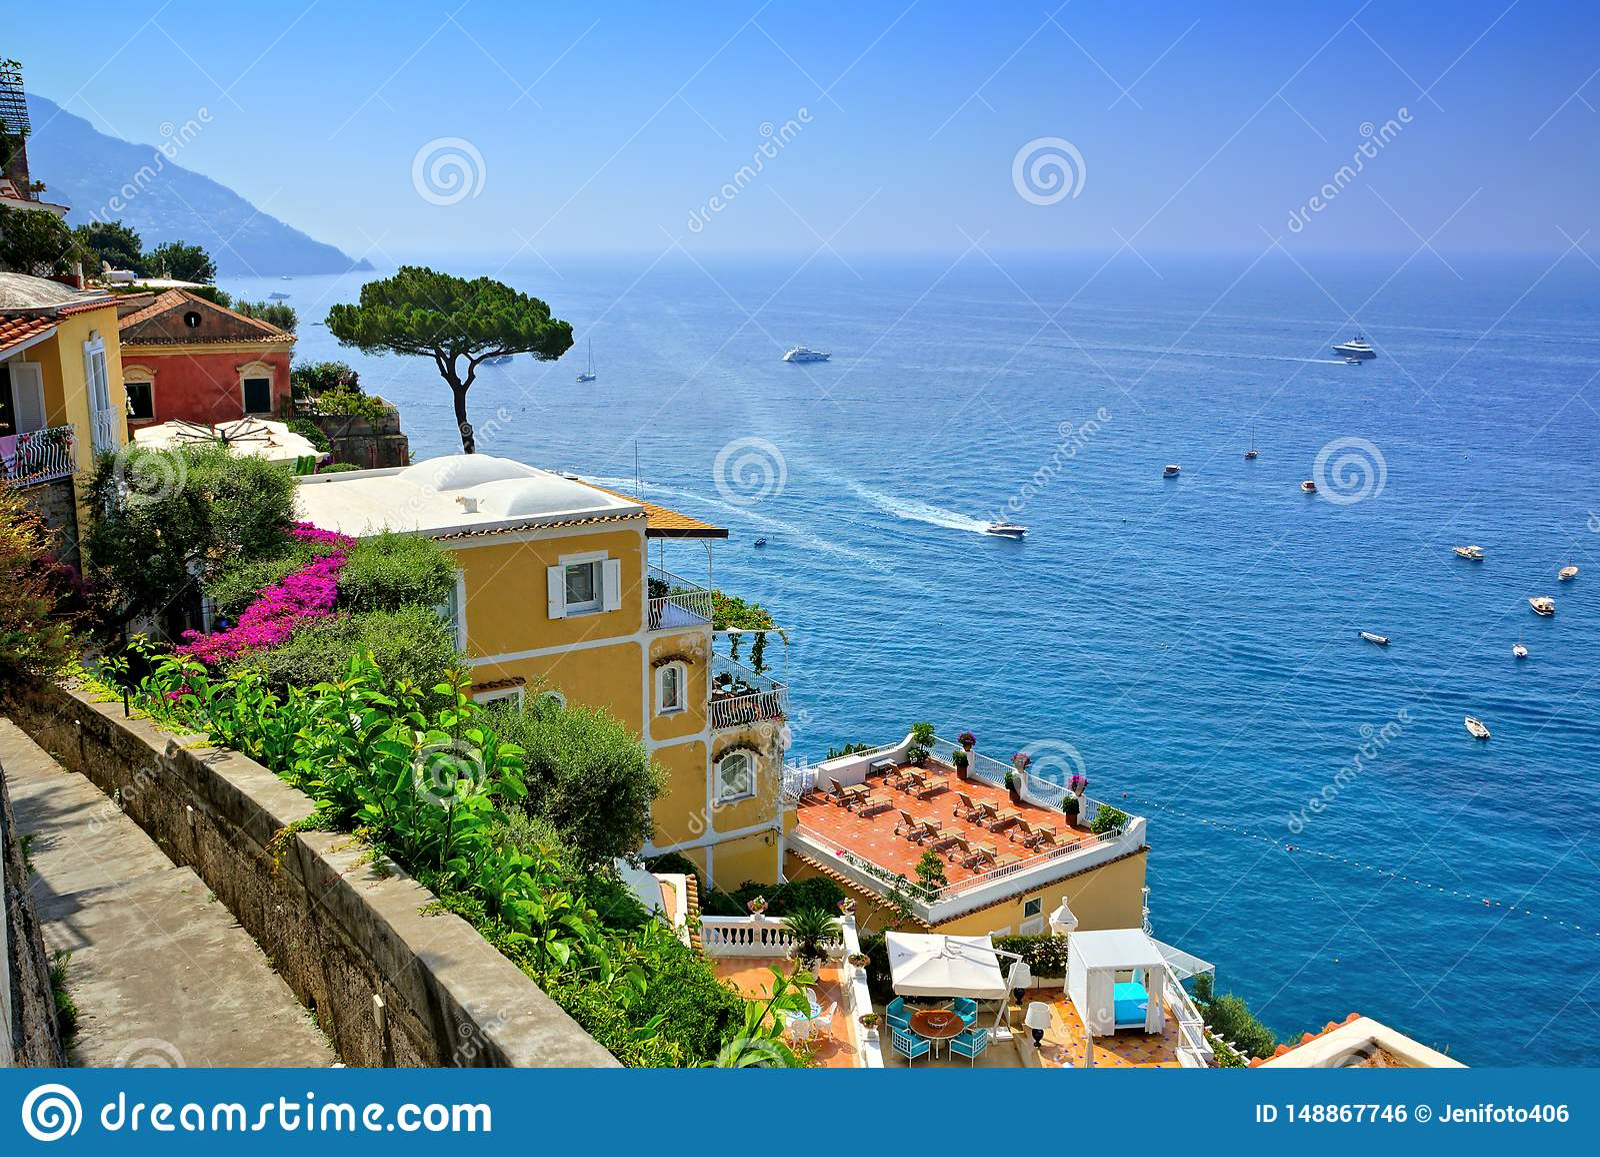 Positano ao longo da costa de Amalfi de Itália, casas de campo luxuosos que negligenciam o mar Mediterrâneo